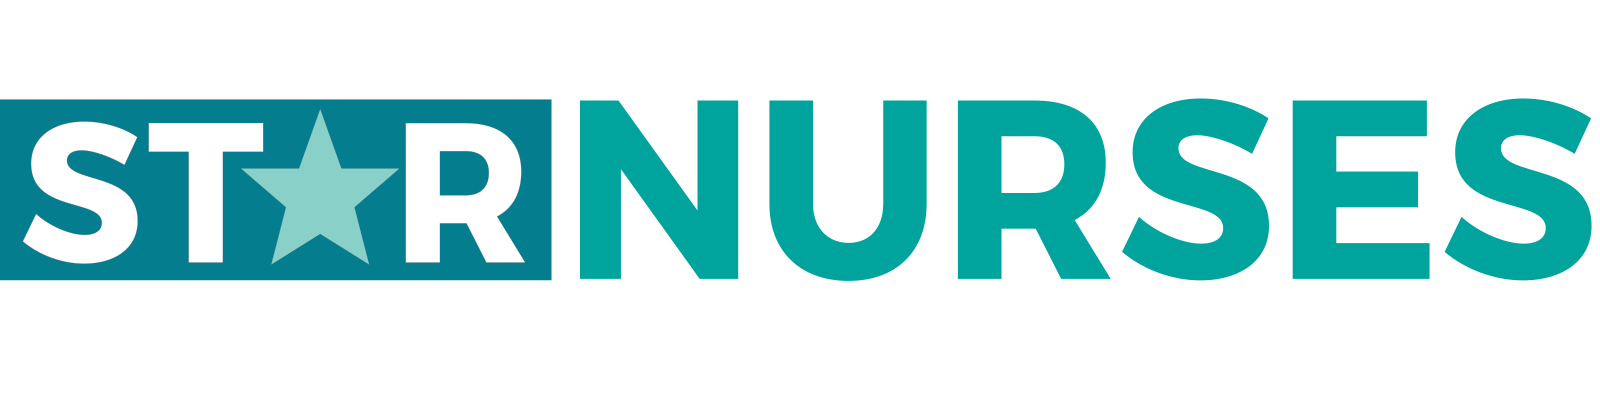 ANA-2289_Star-Nurses-Blue-Logo